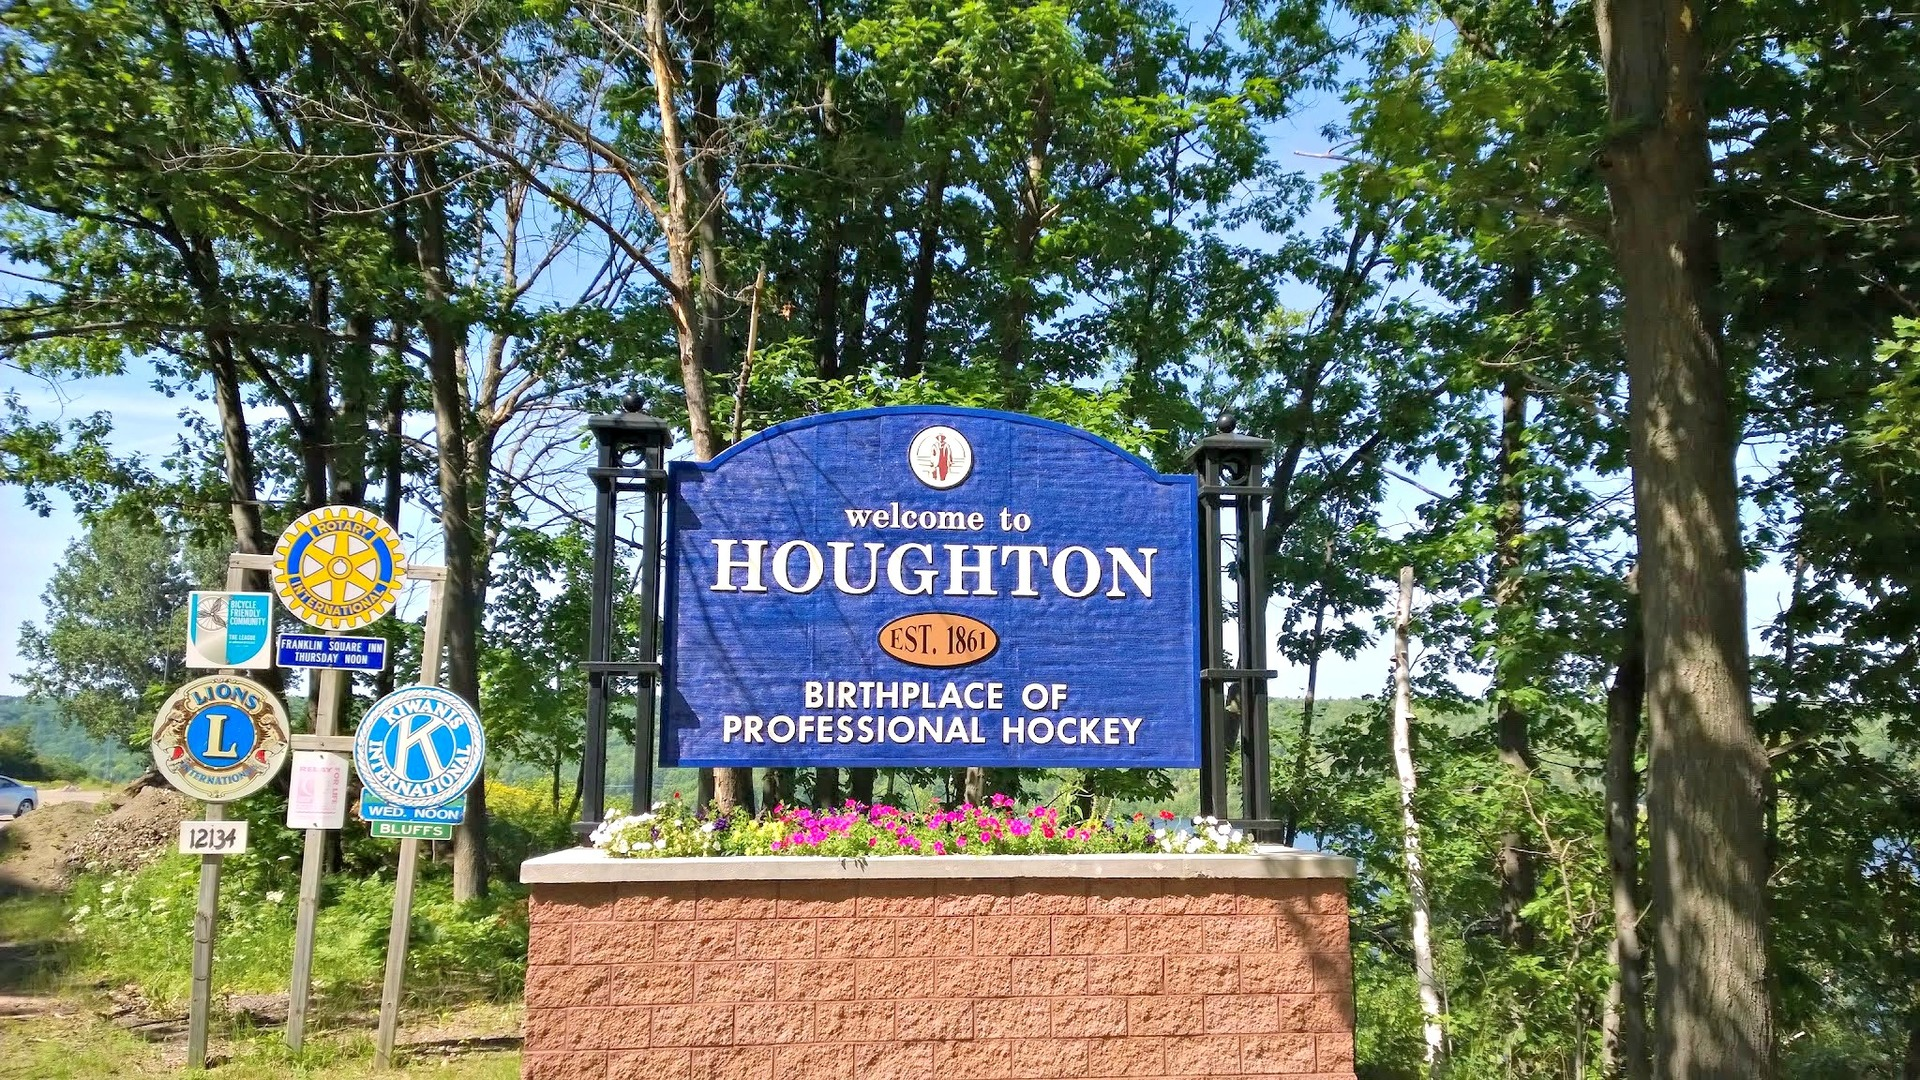 Welcome to Houghton! | elise81, houghton, michigab, michigan